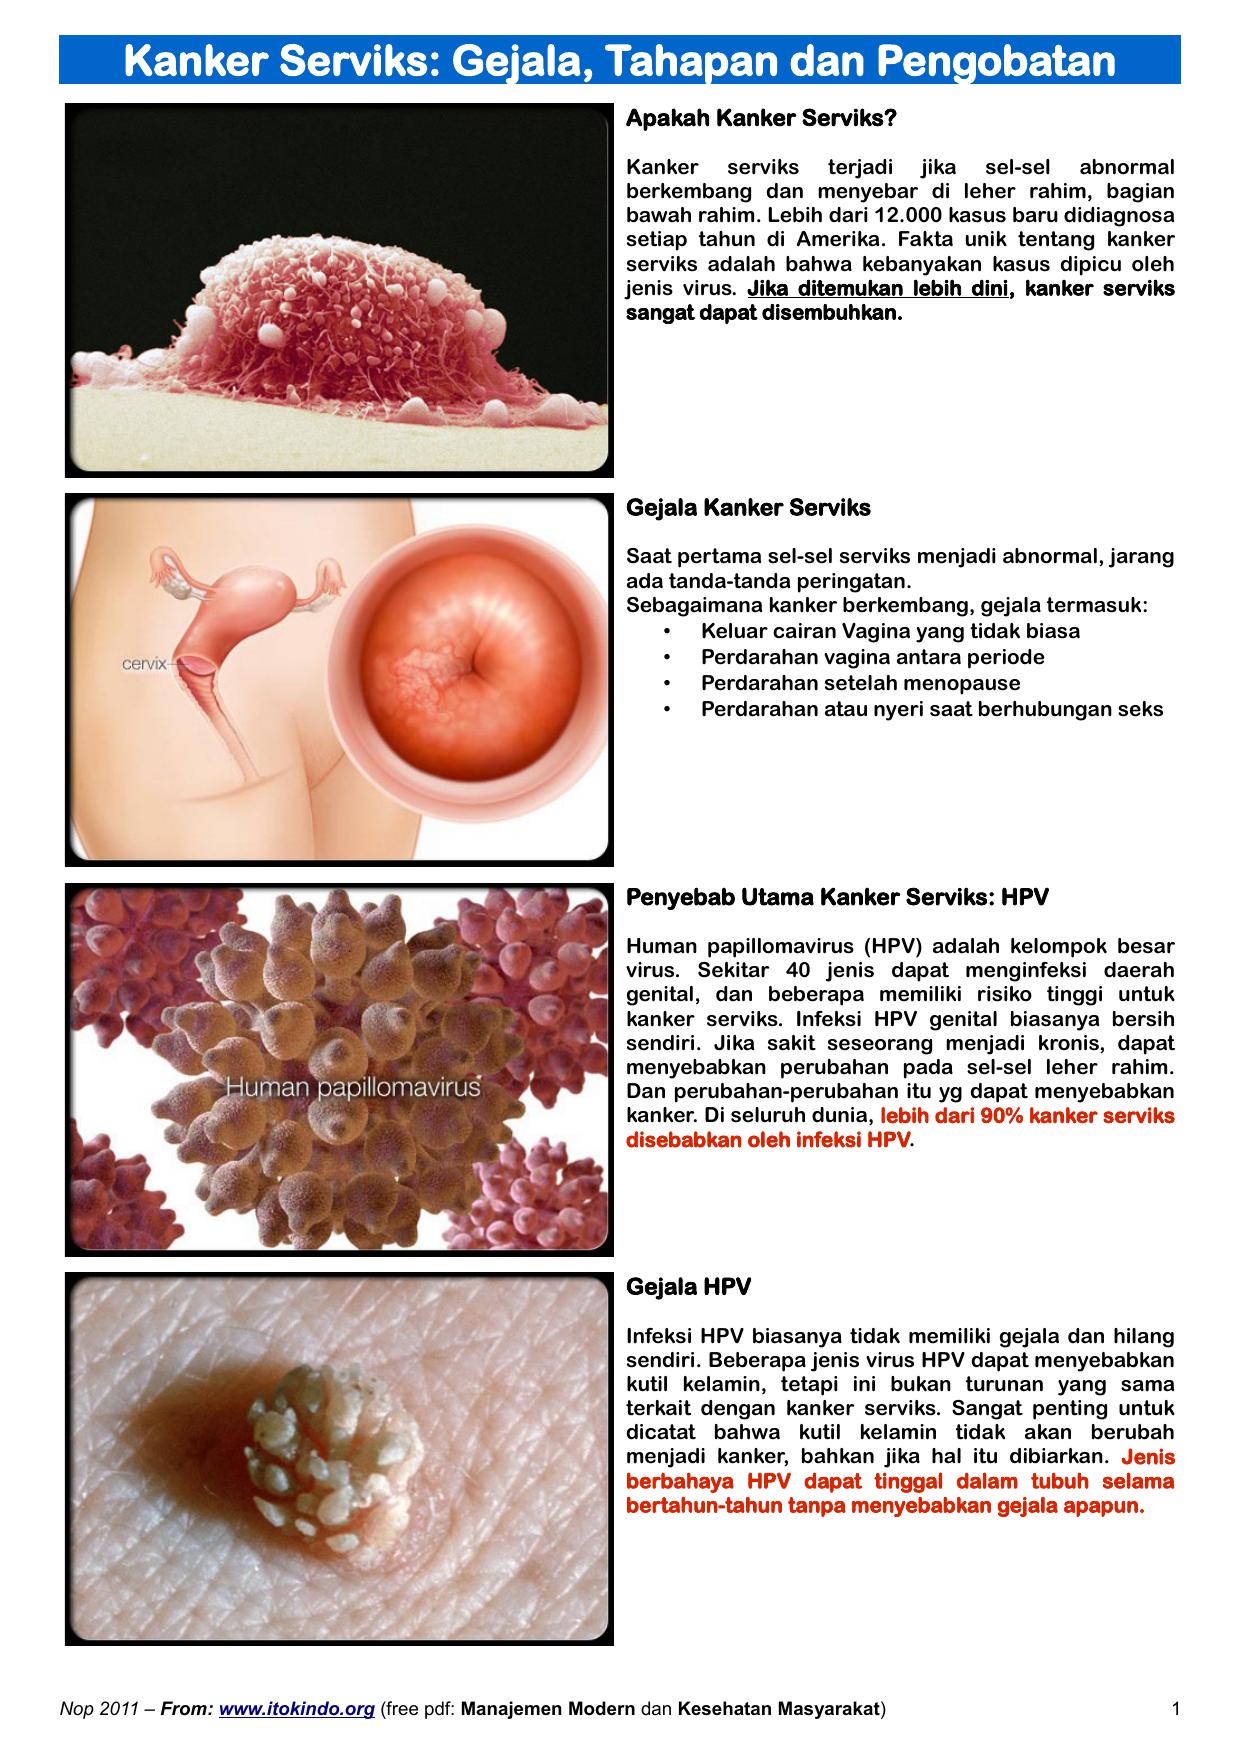 hpv vírus pada kanker serviks)